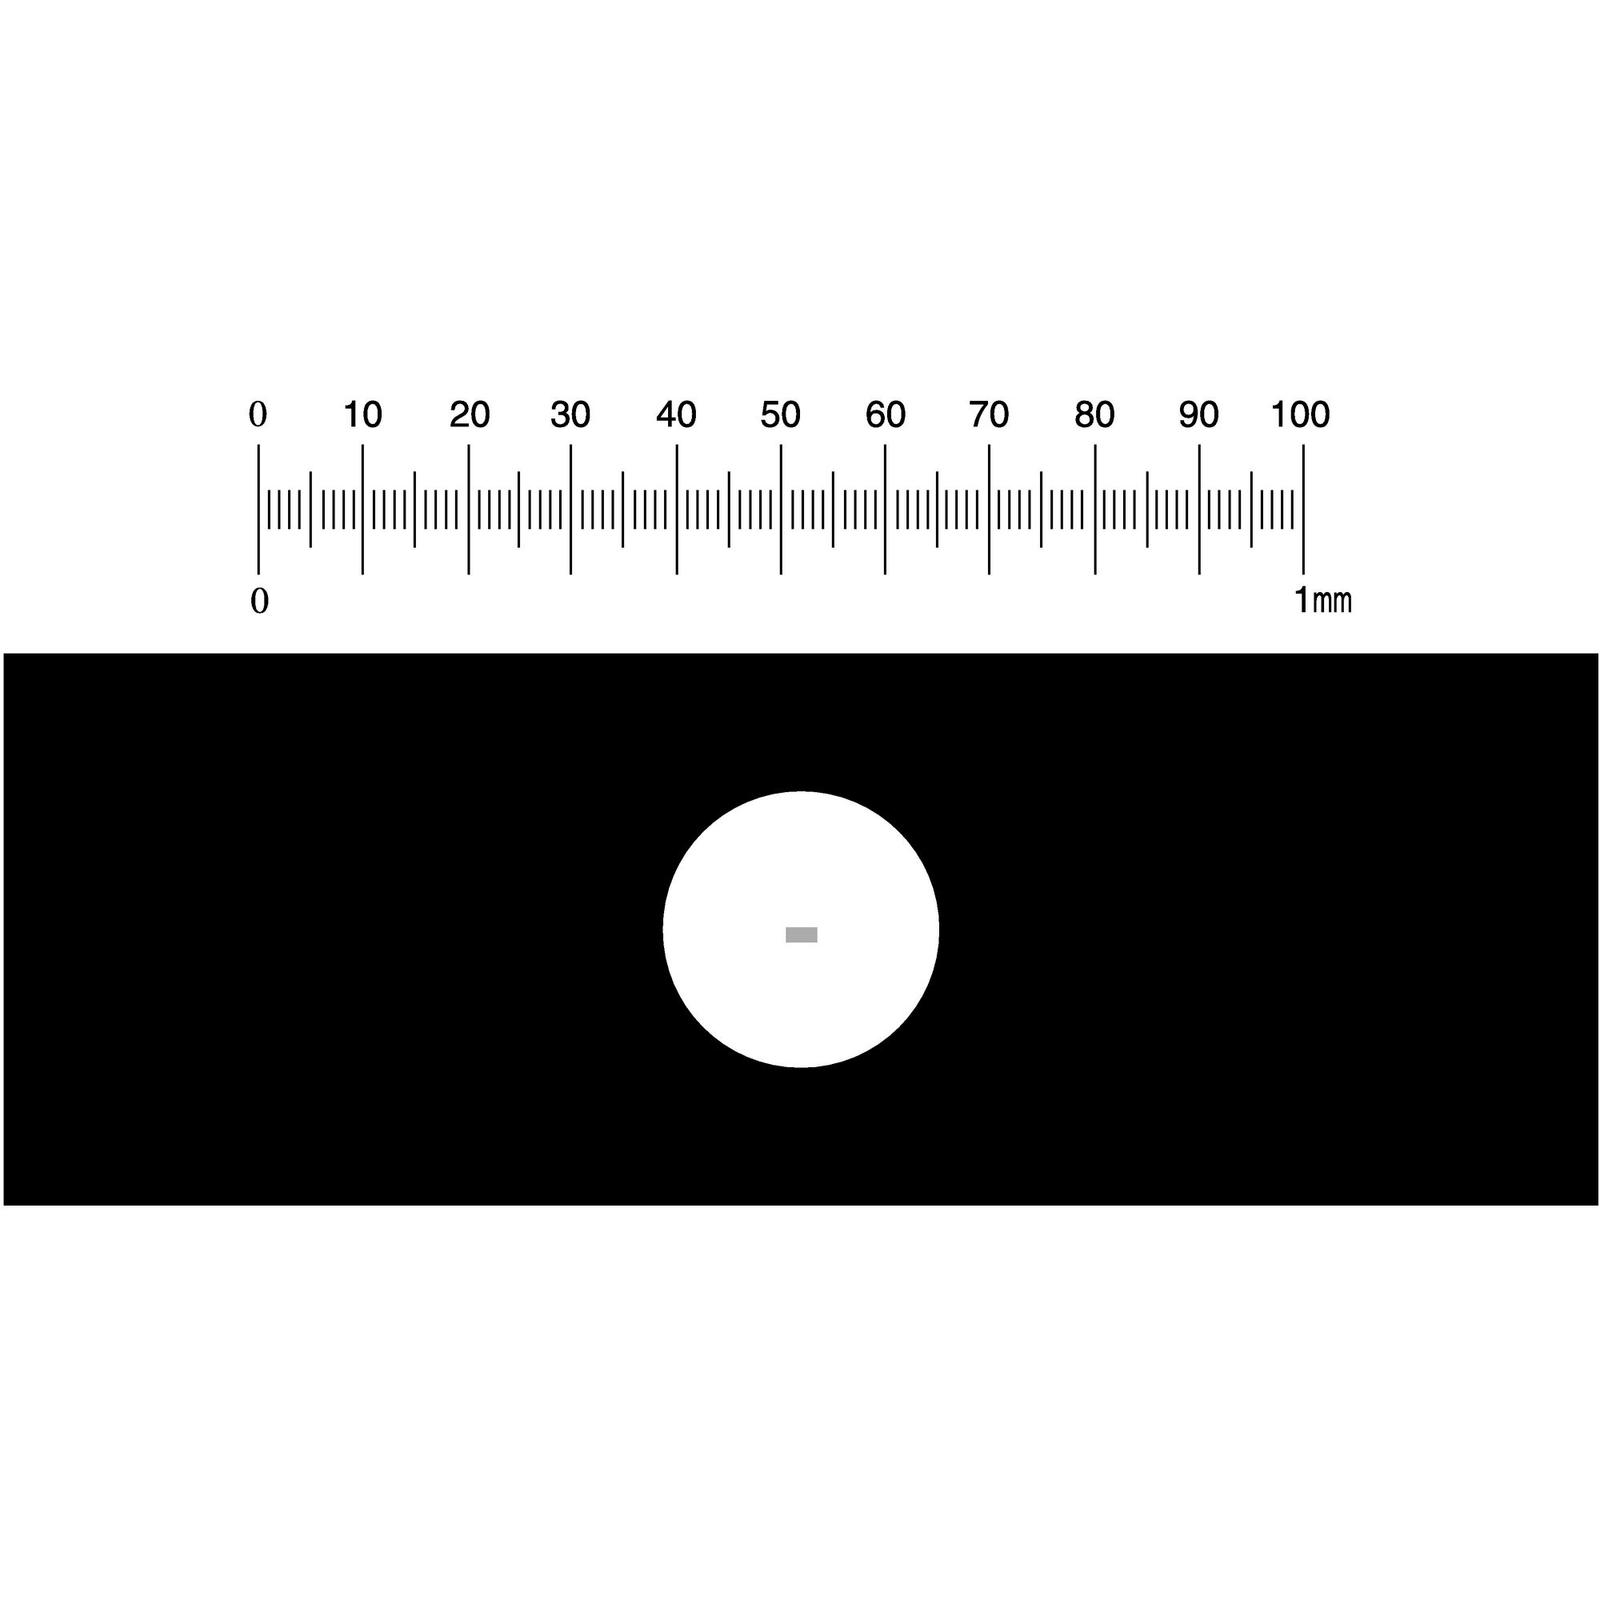 Stage micrometer philip harris stage micrometer buycottarizona Gallery